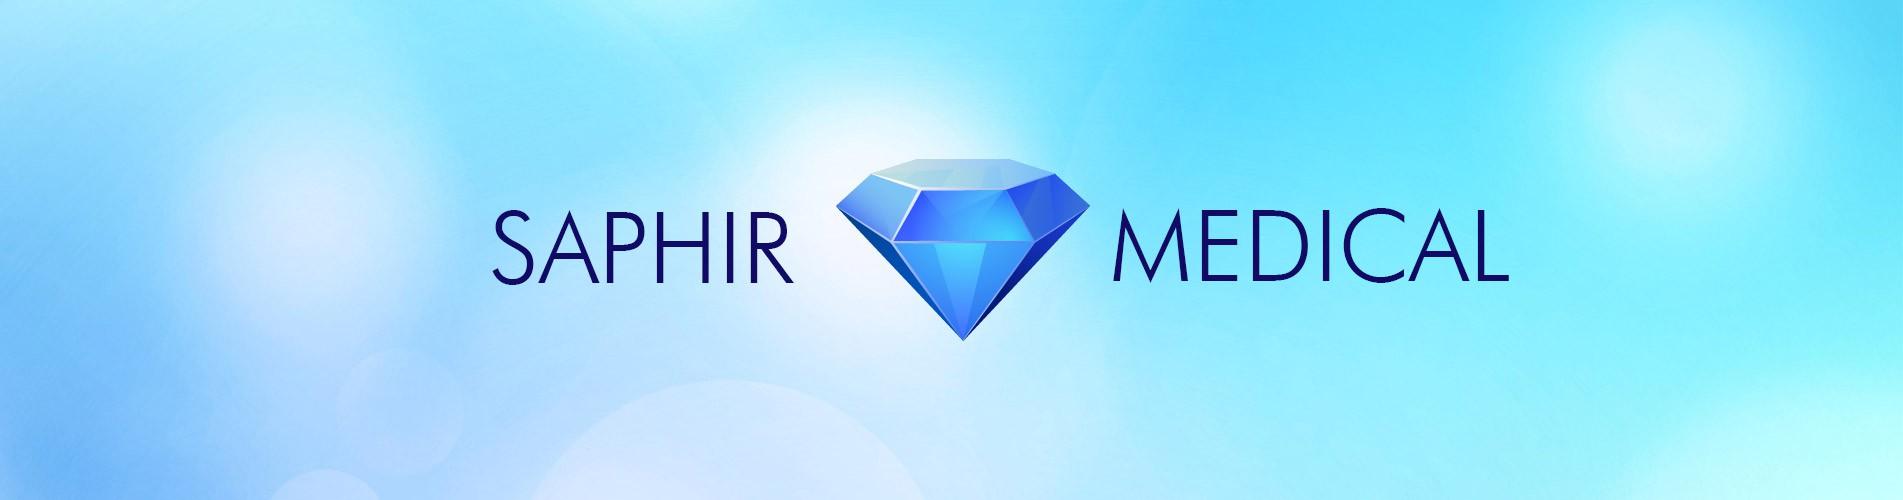 Saphir Medical